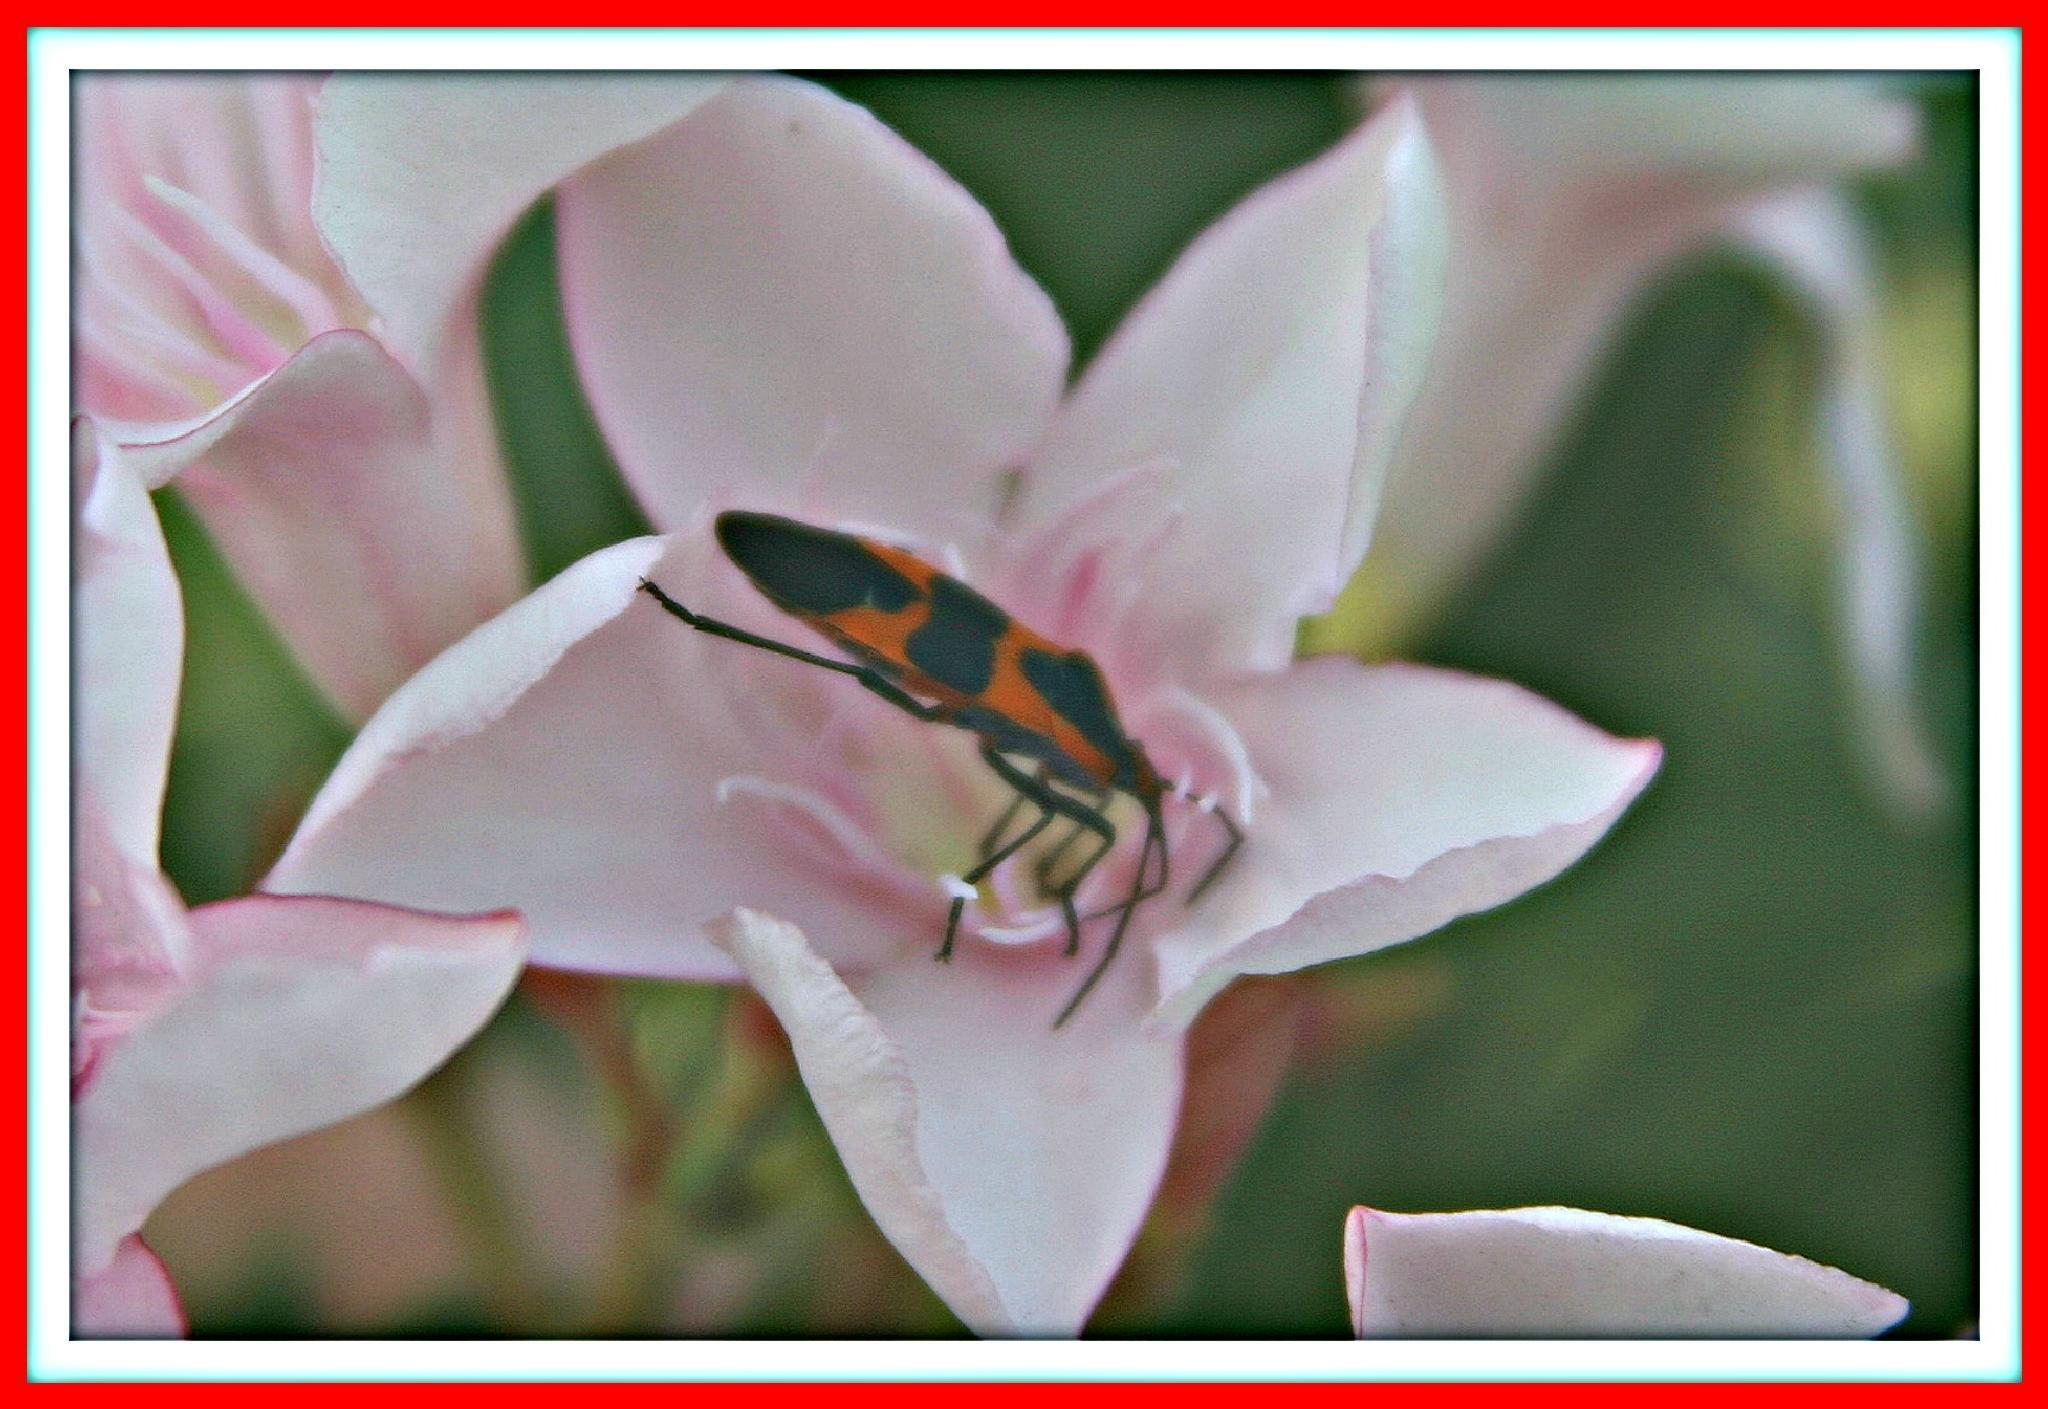 LOVEBUG IN FLOWER by bechcomber444